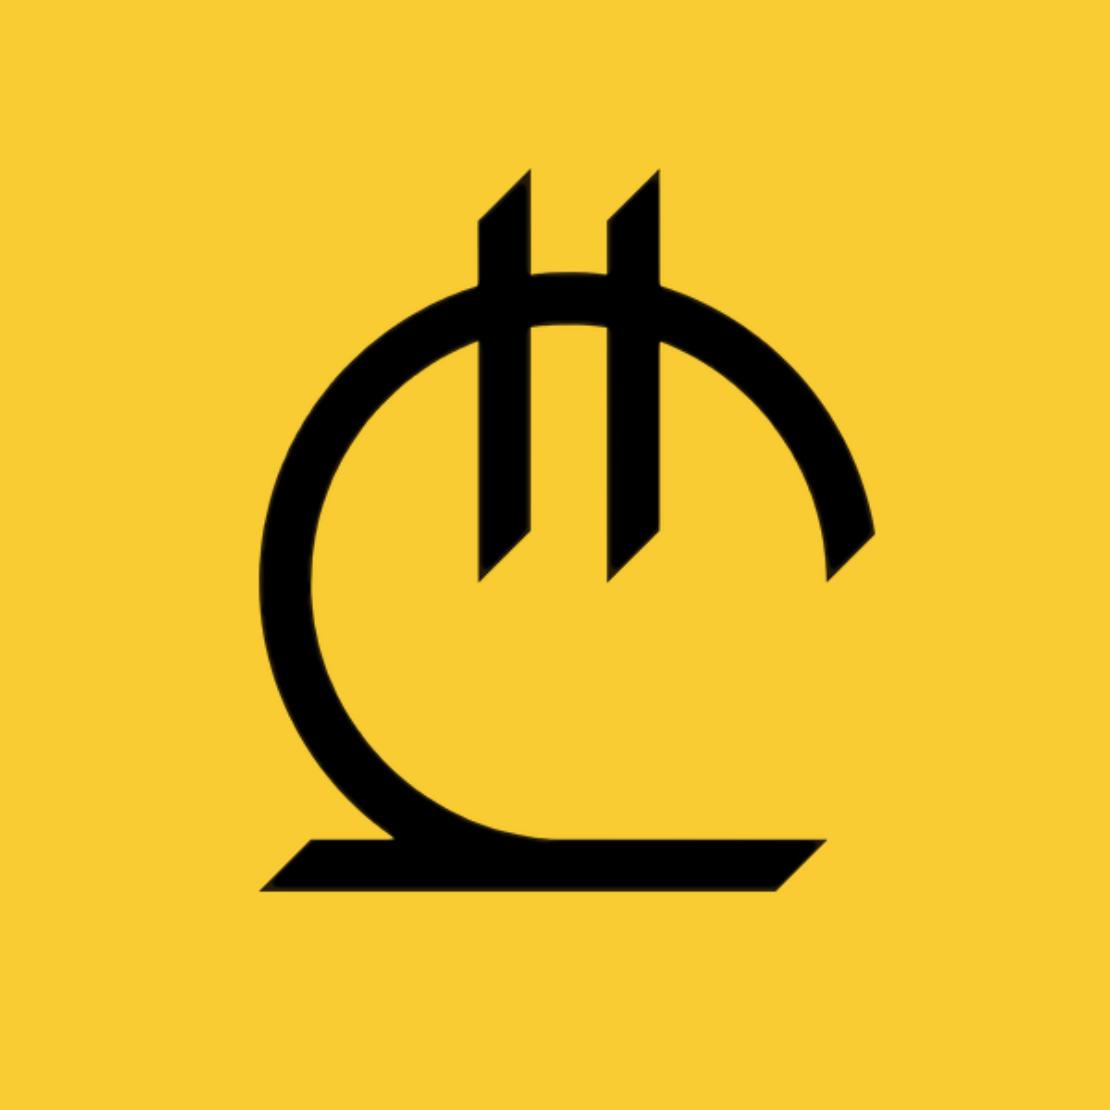 Currency Symbols Money Symbols  Economy Watch